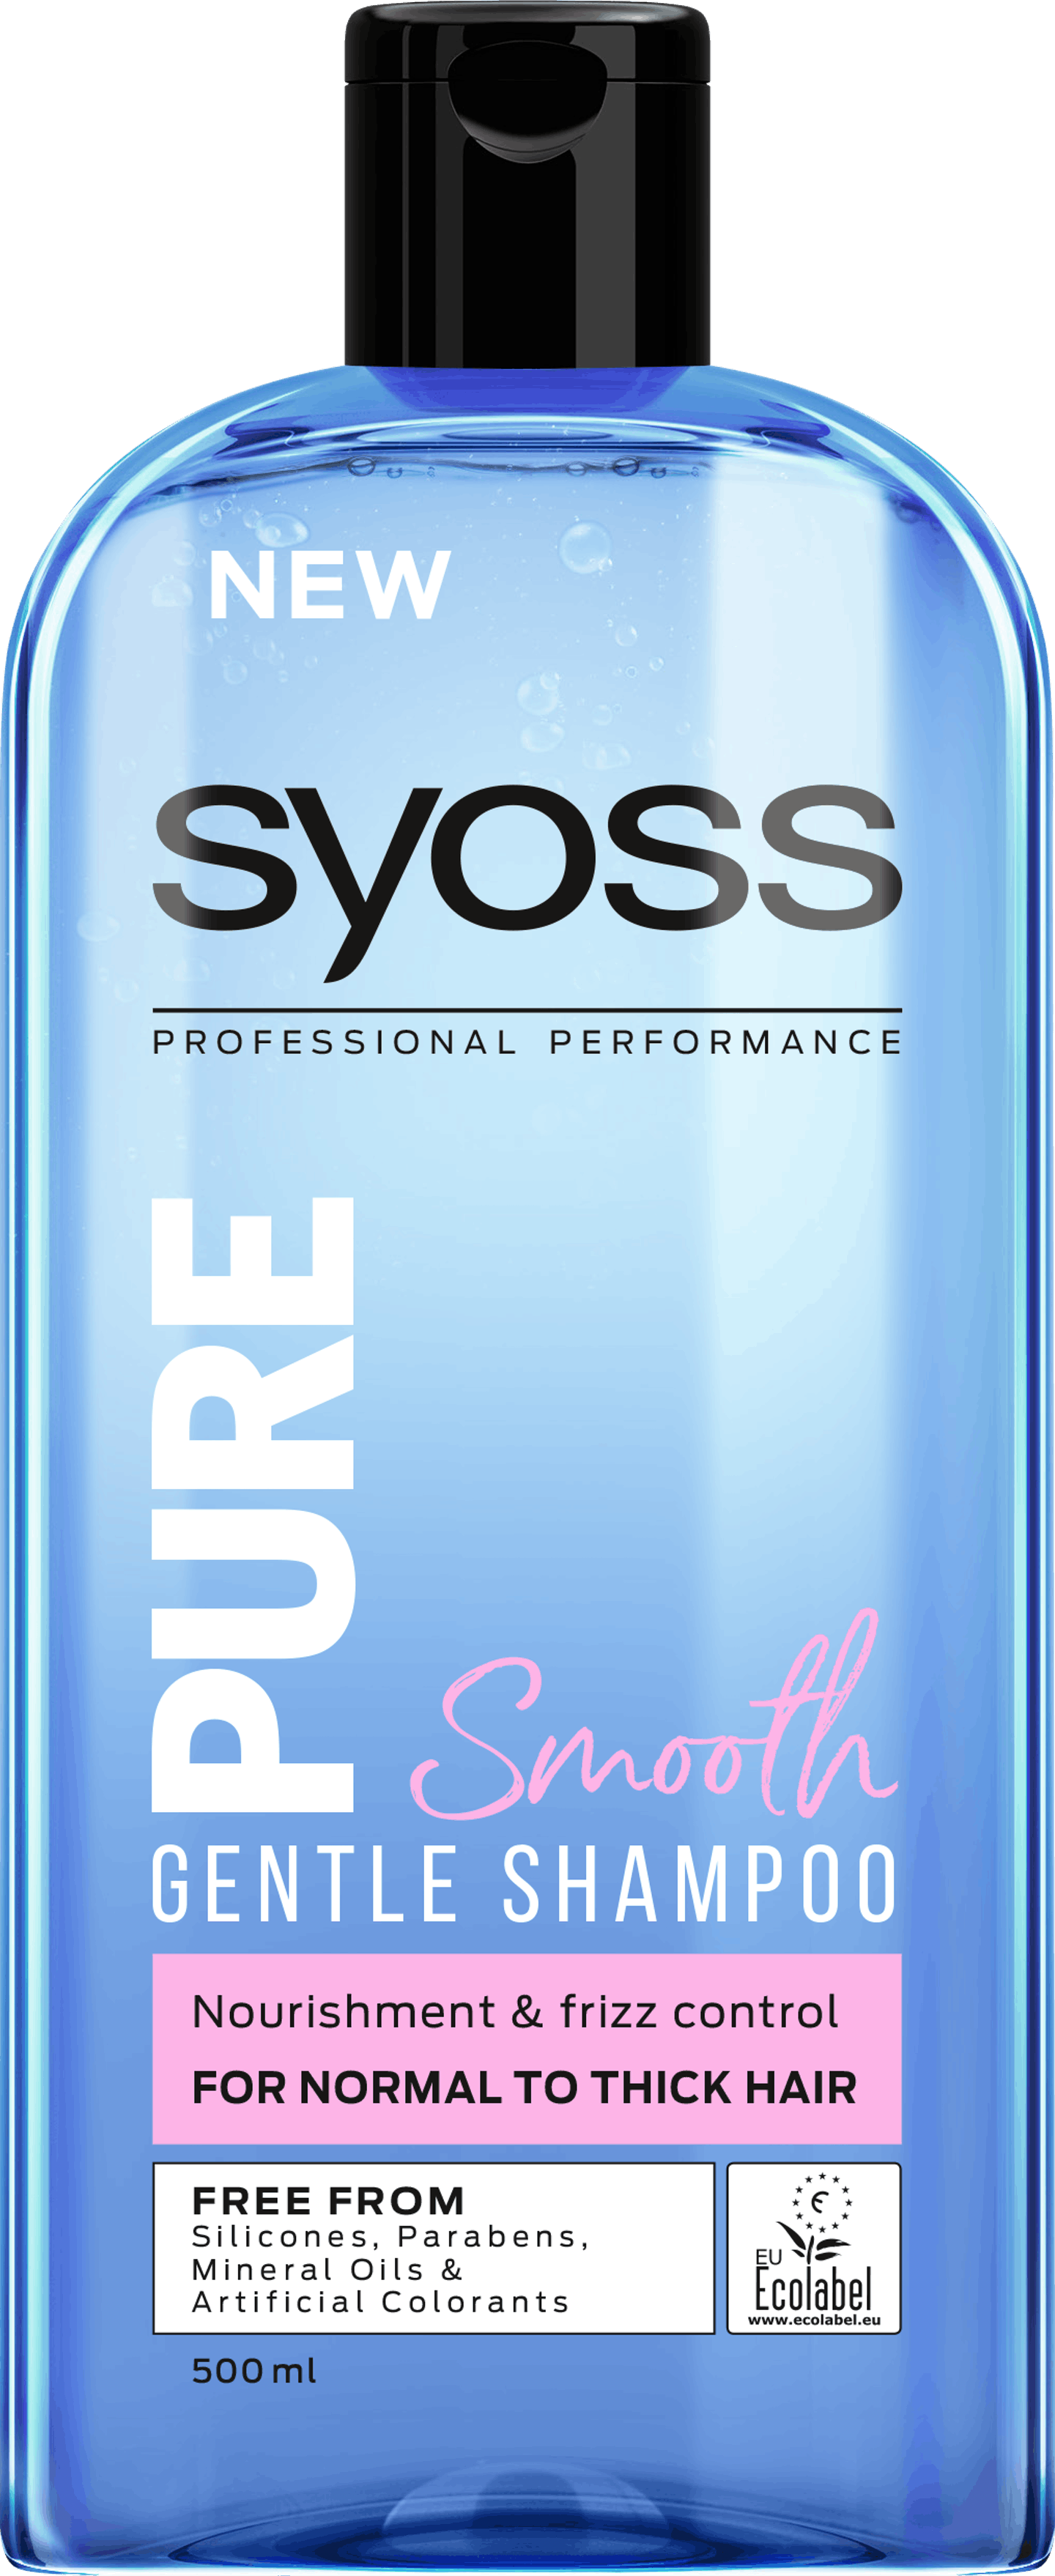 Syoss Pure Smooth Shampoo